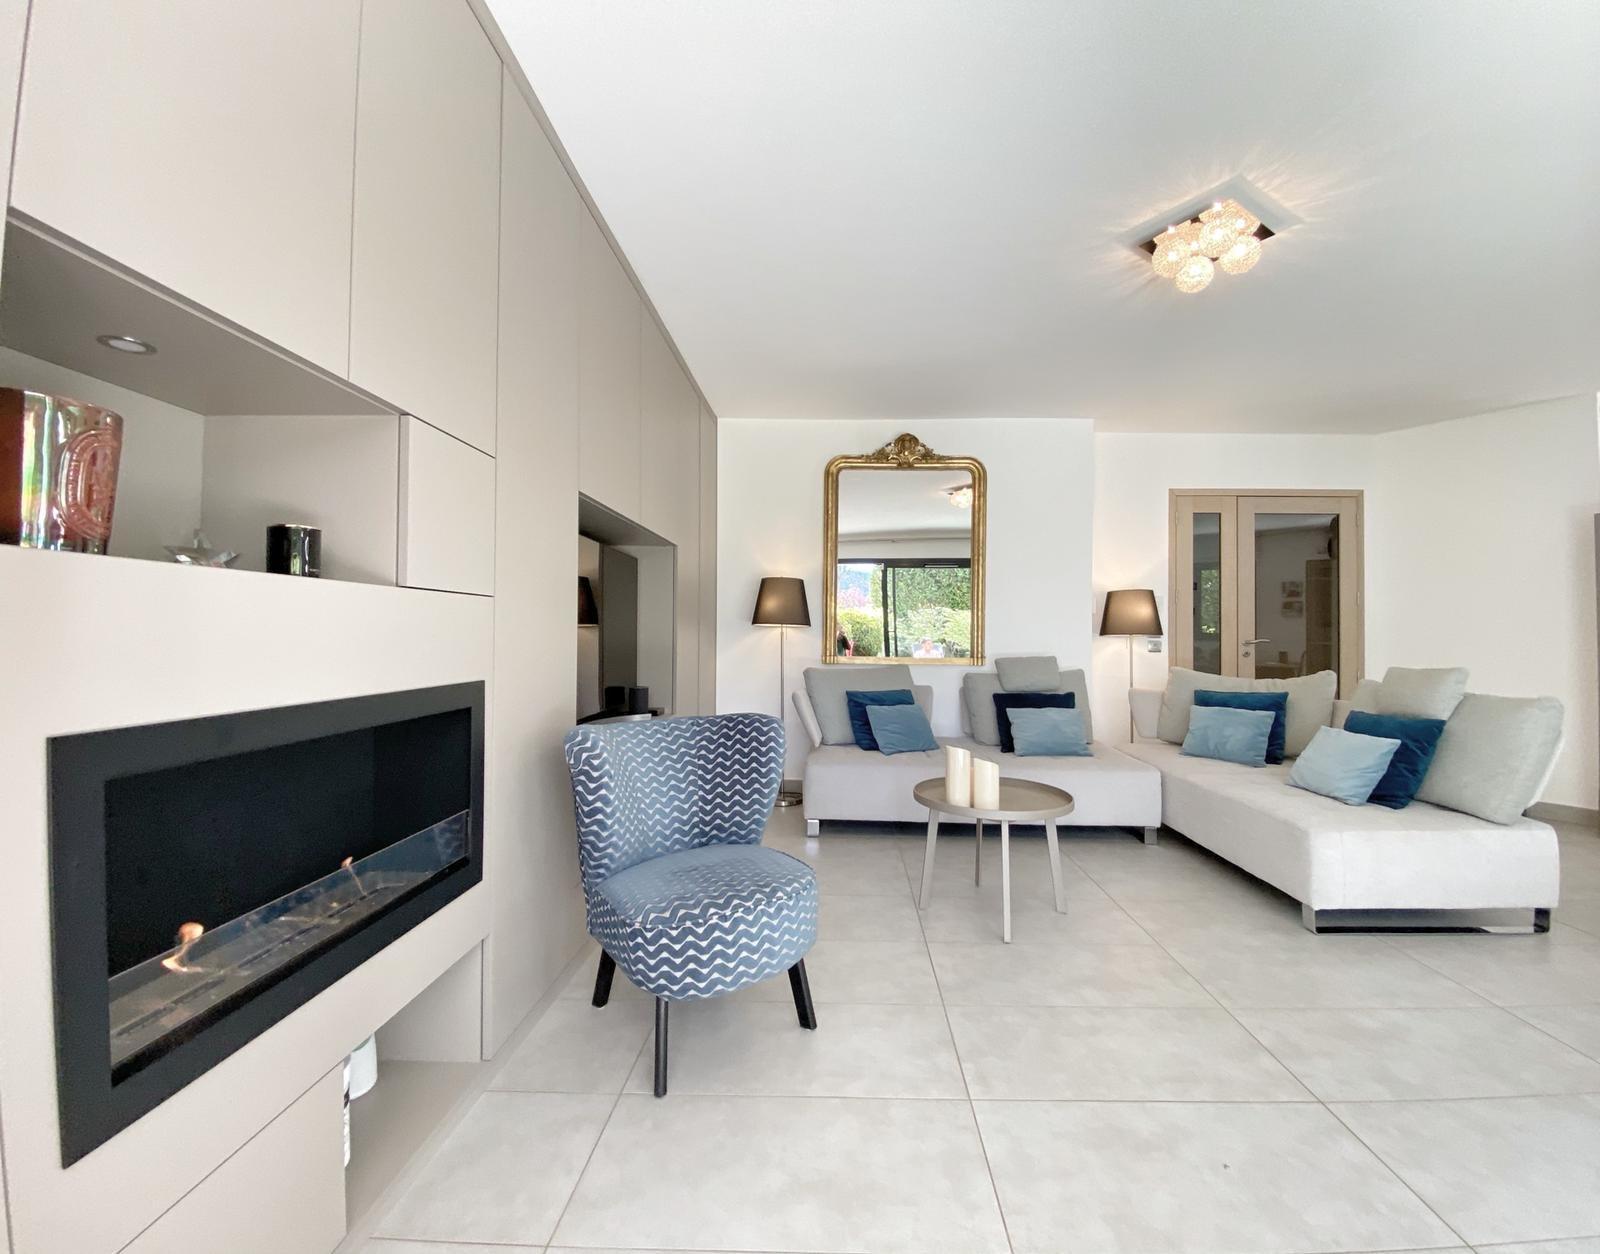 Sale Apartment - Annecy Parmelan - Albigny